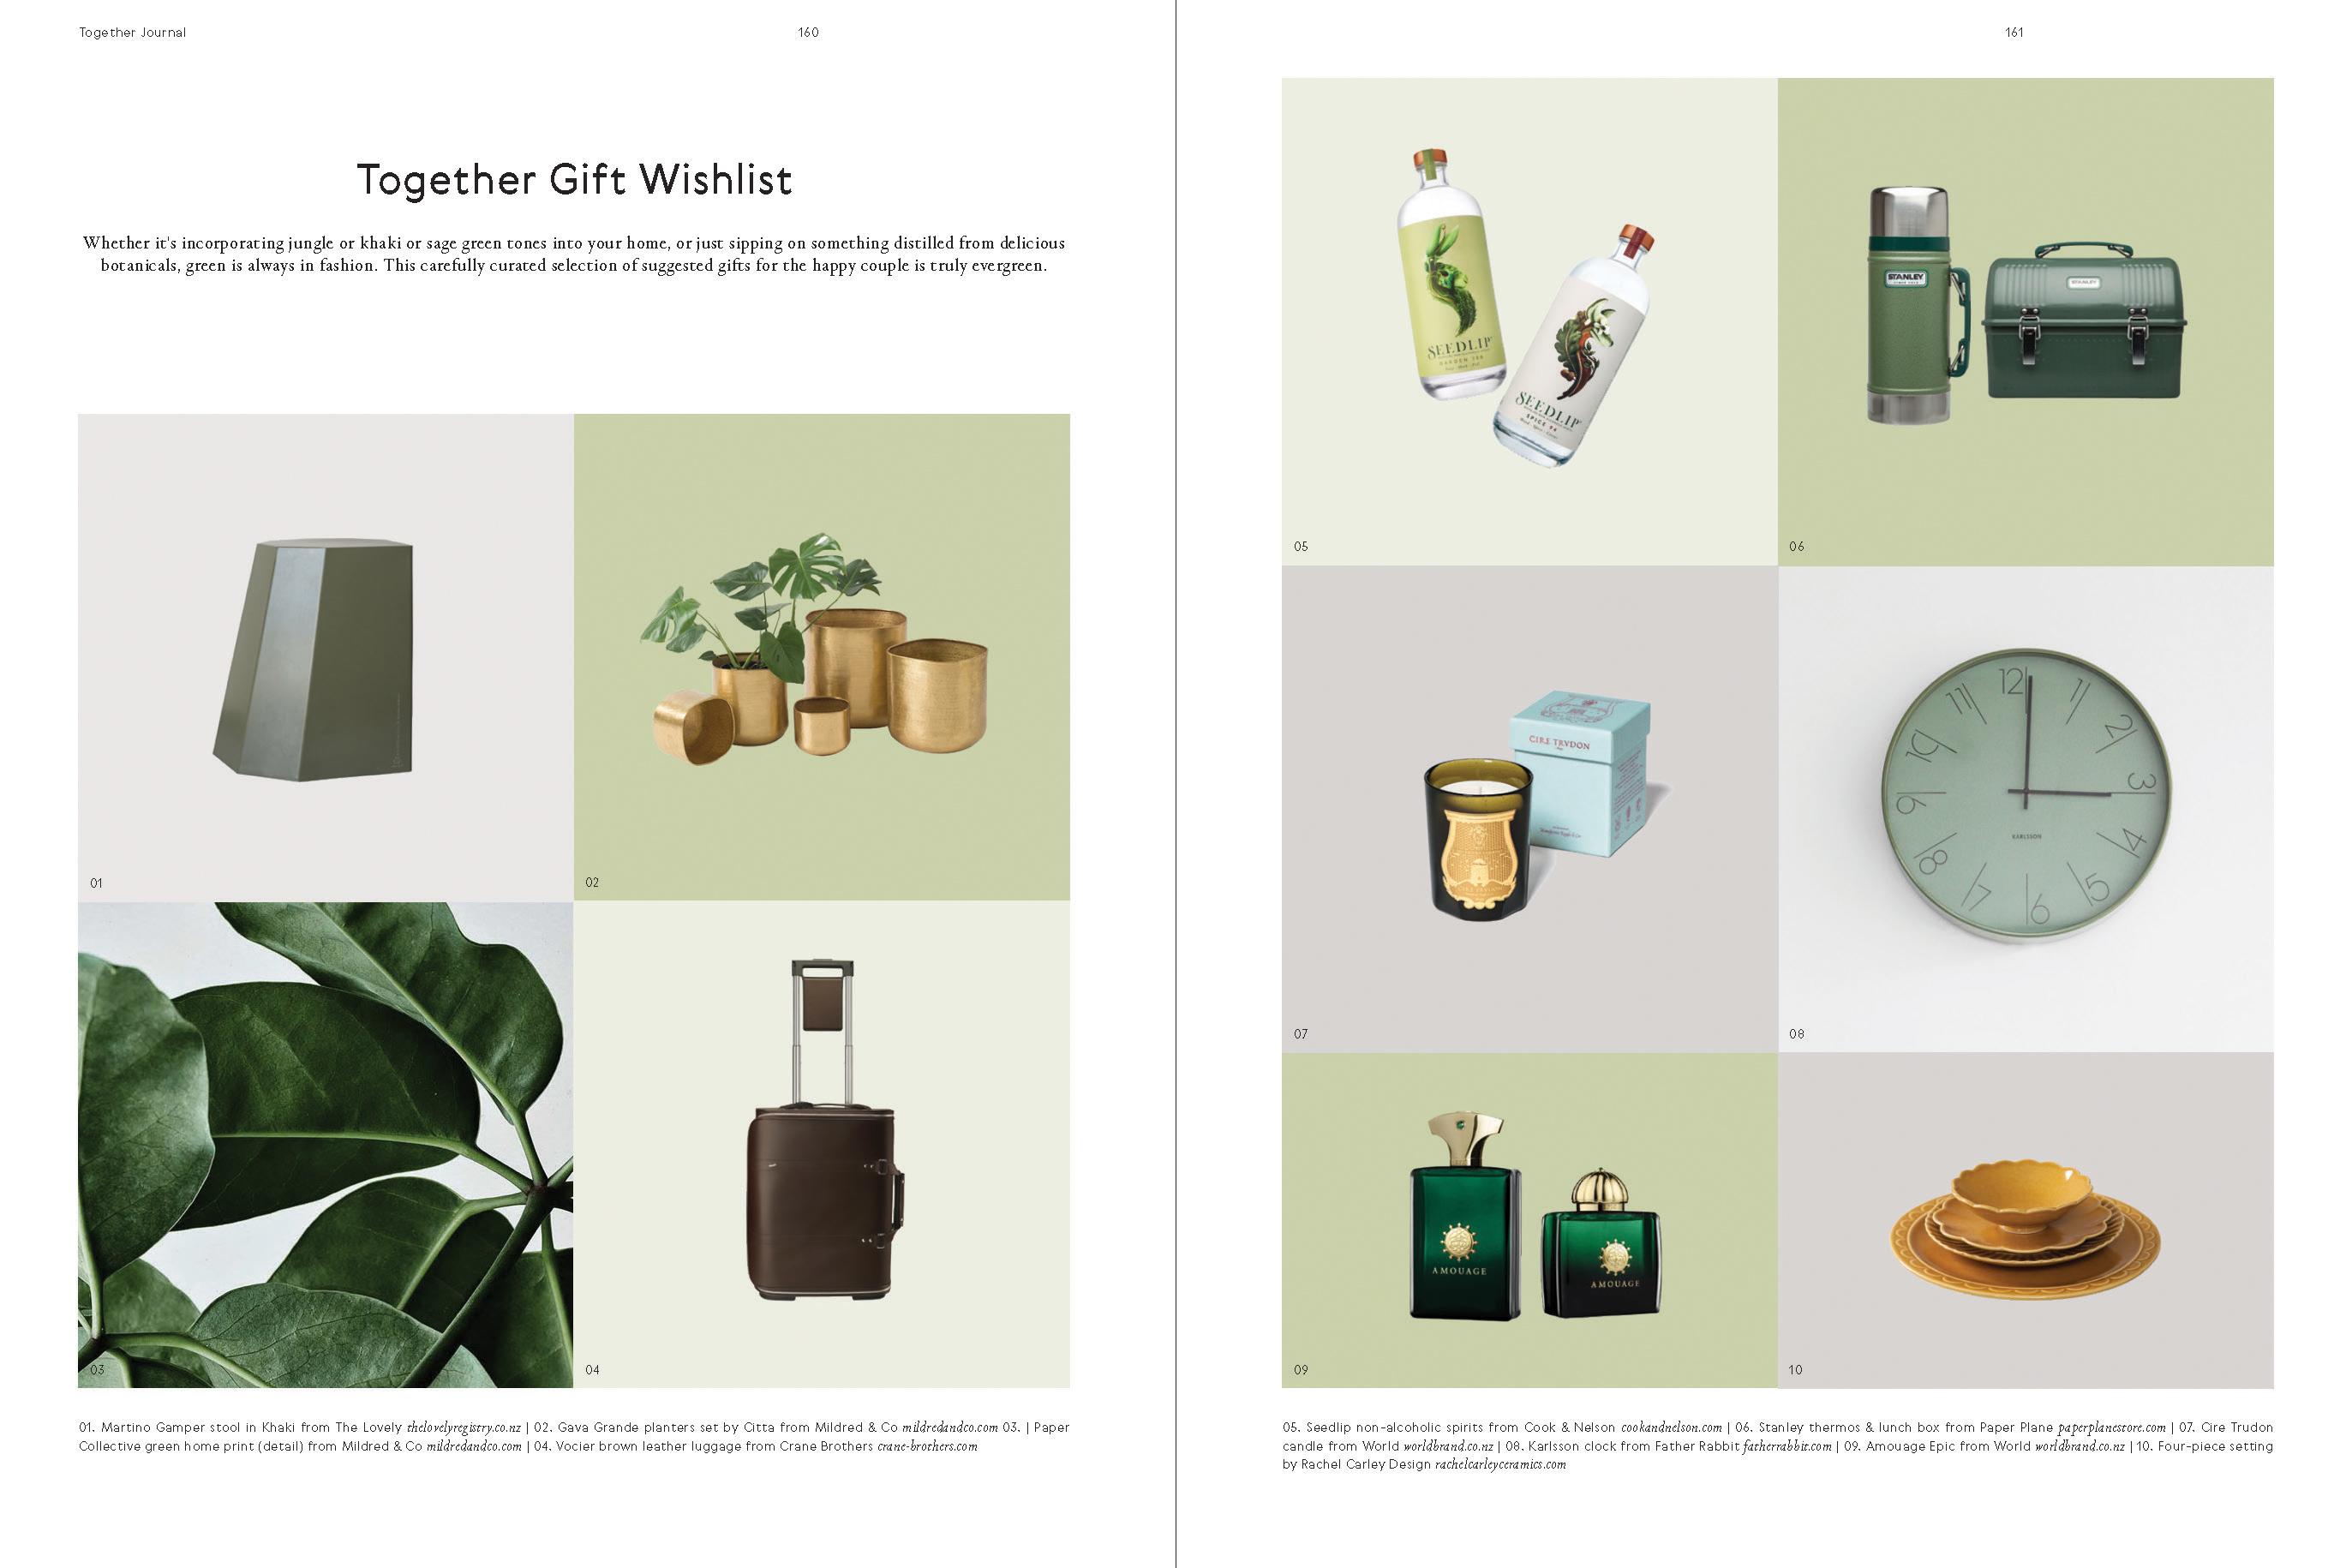 Categories: Inspiration-Gift Wishlist